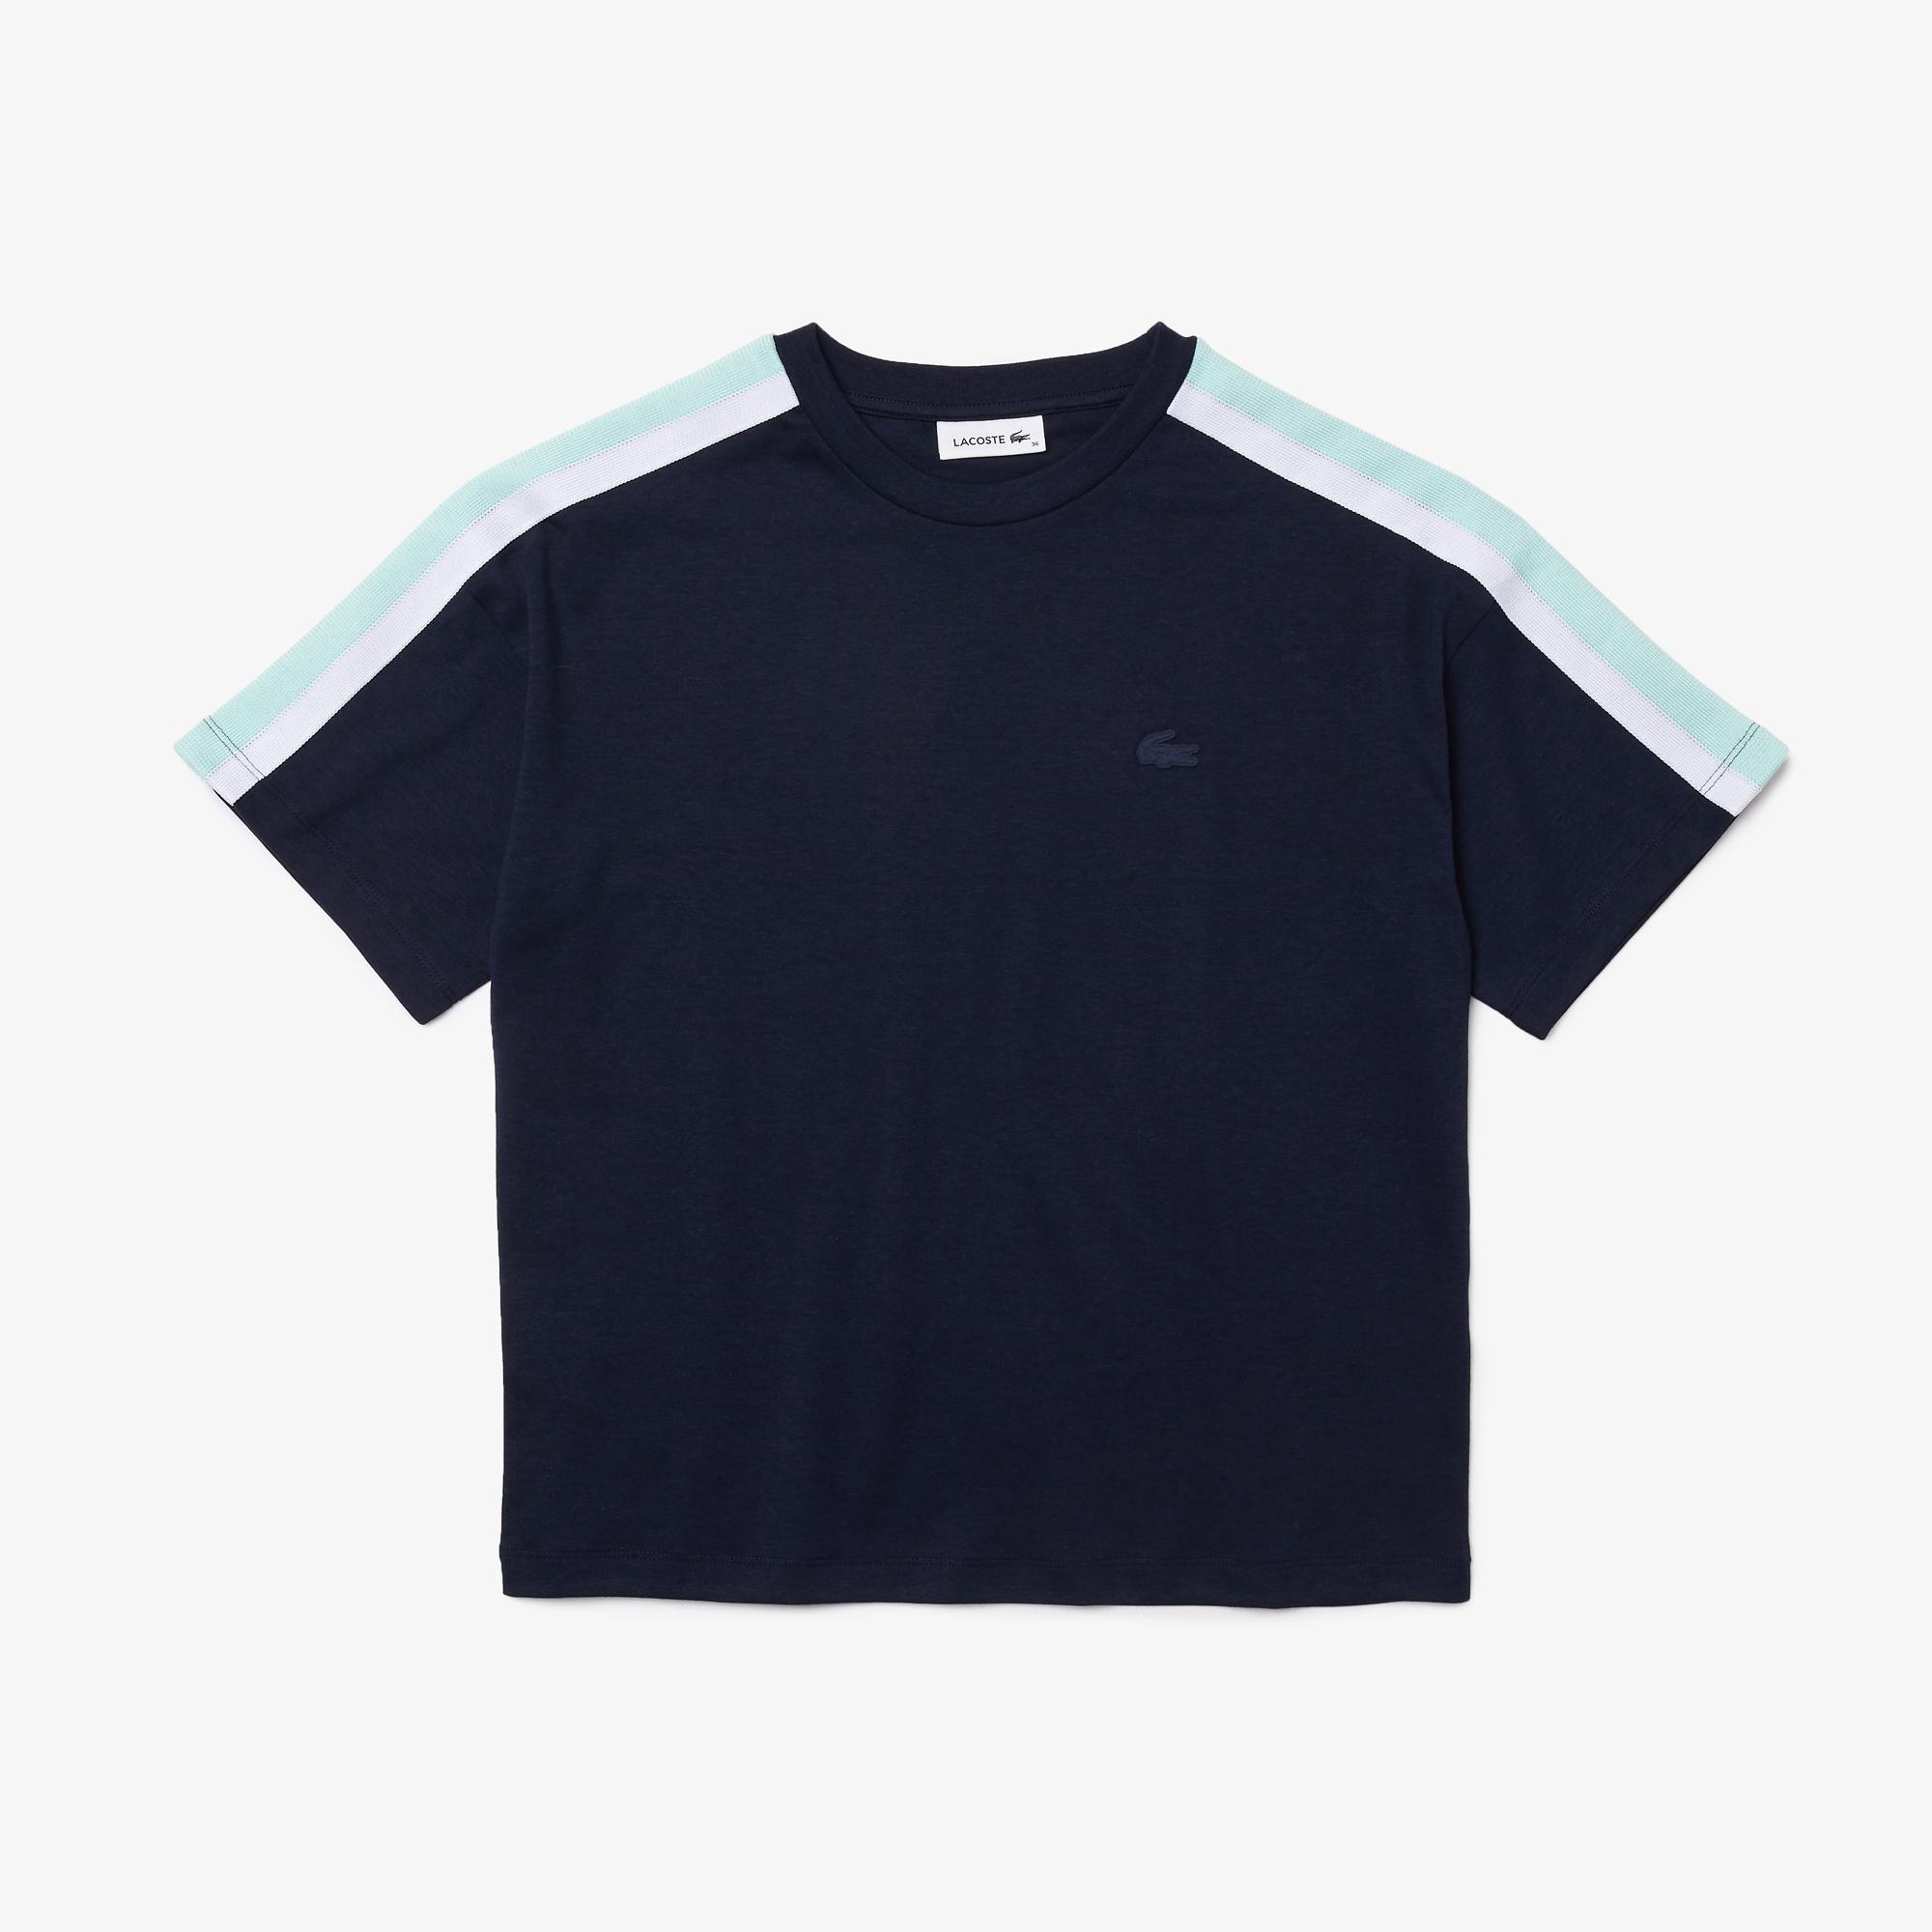 Lacoste Kadın Bisiklet Yaka Lacivert T-Shirt